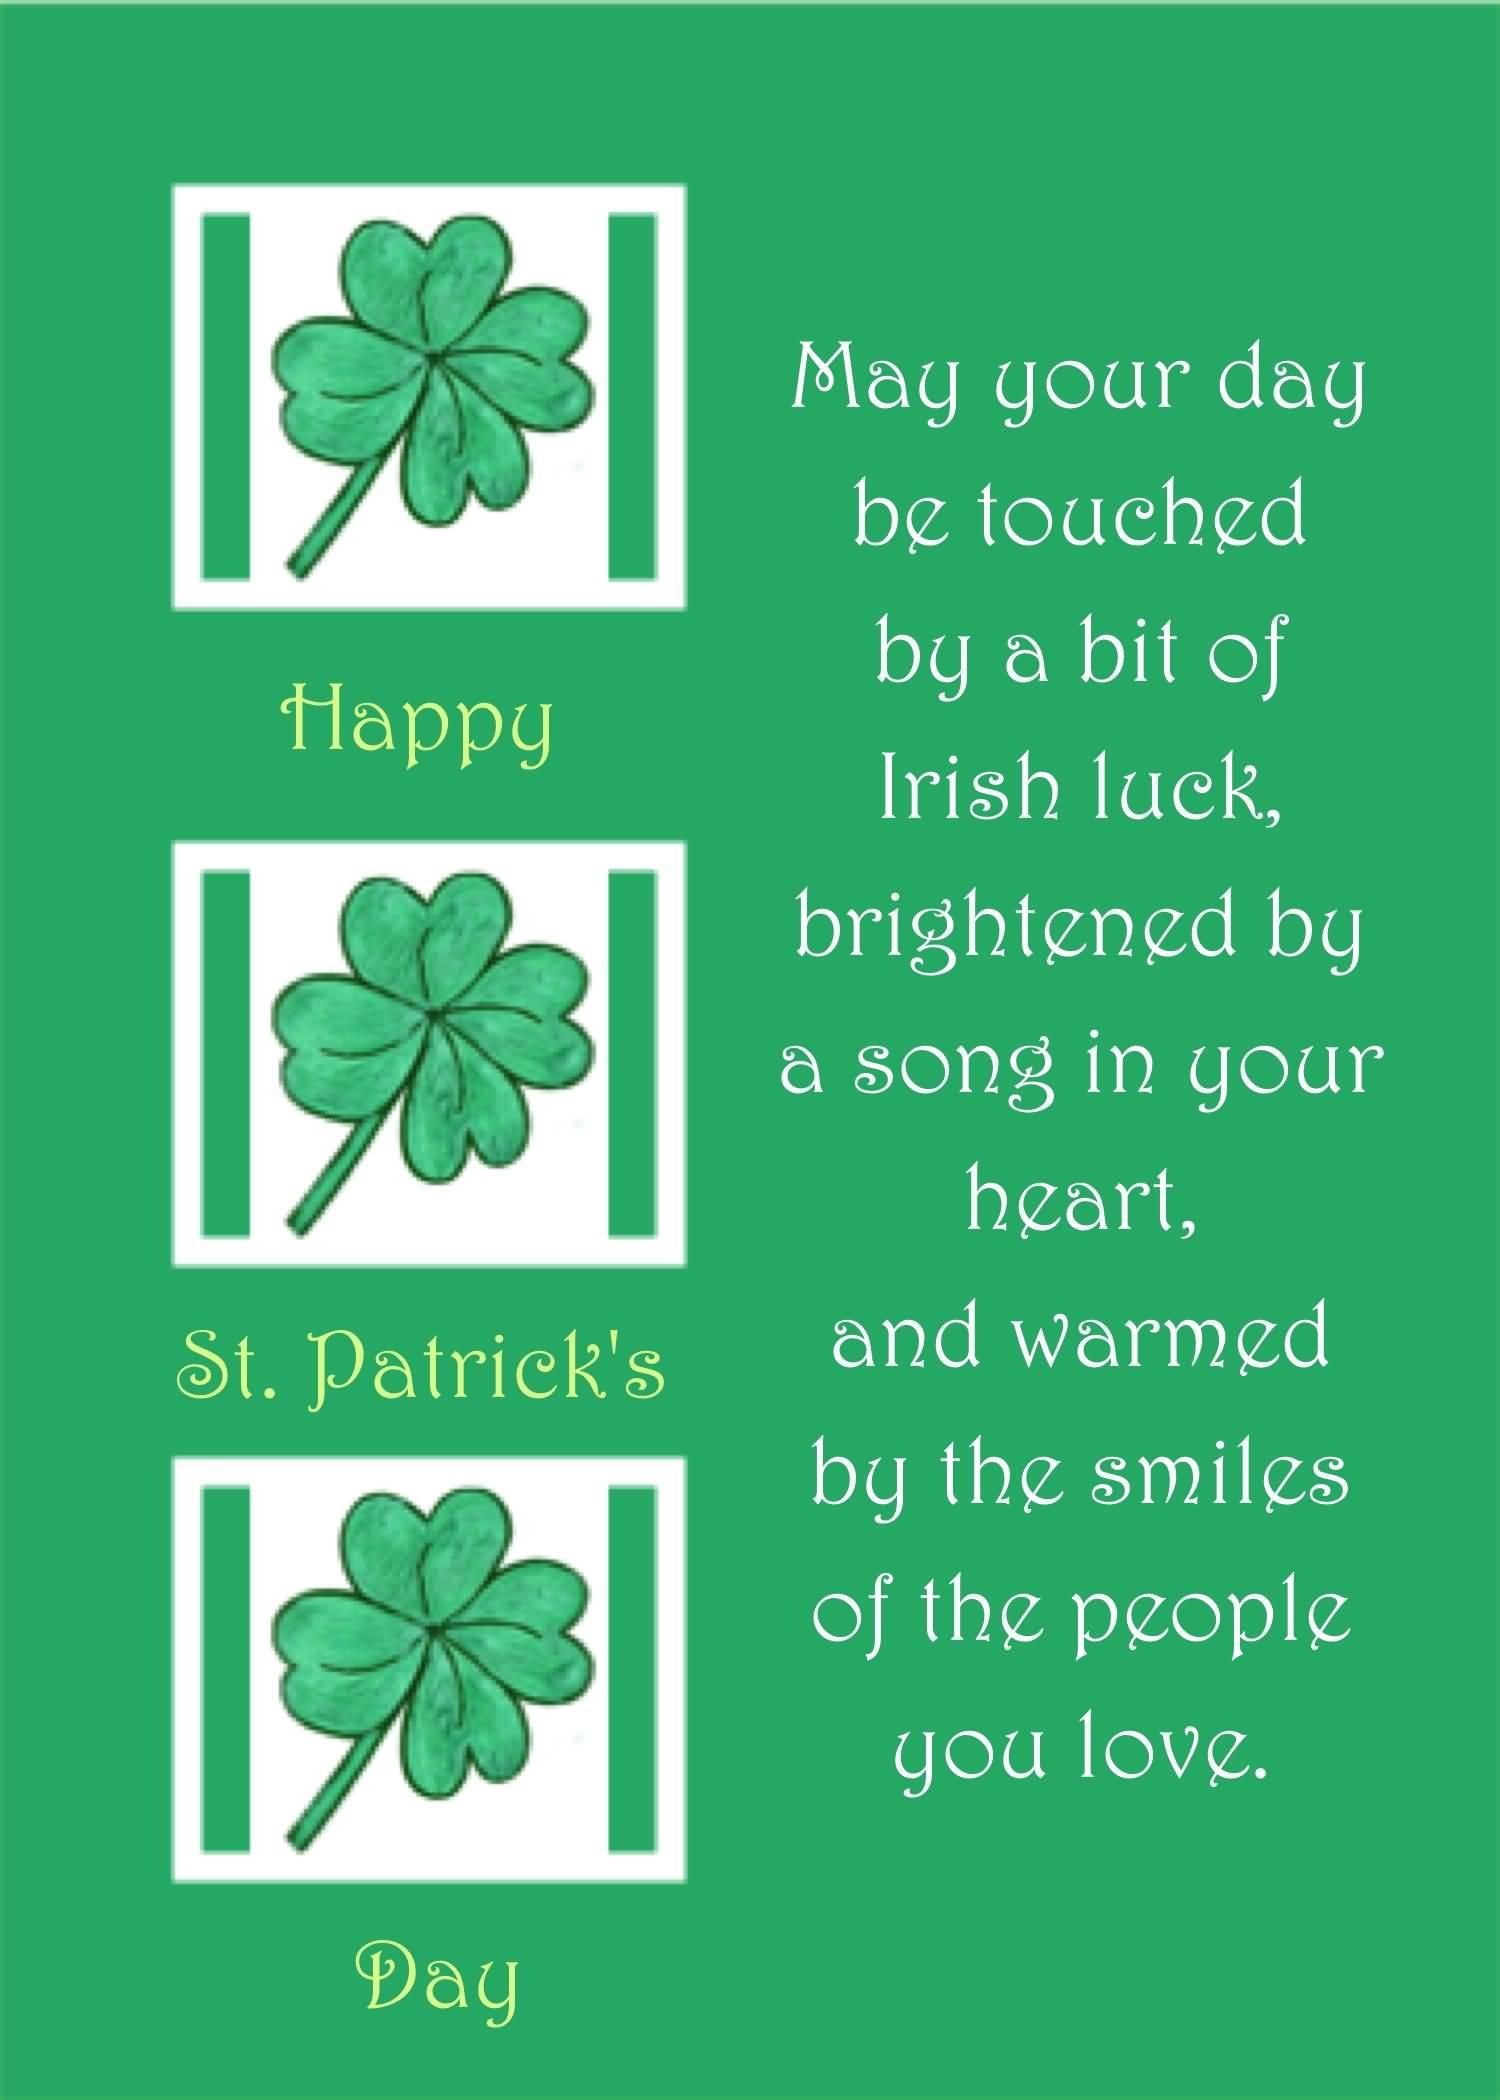 St. Patrick's Day Wish 04